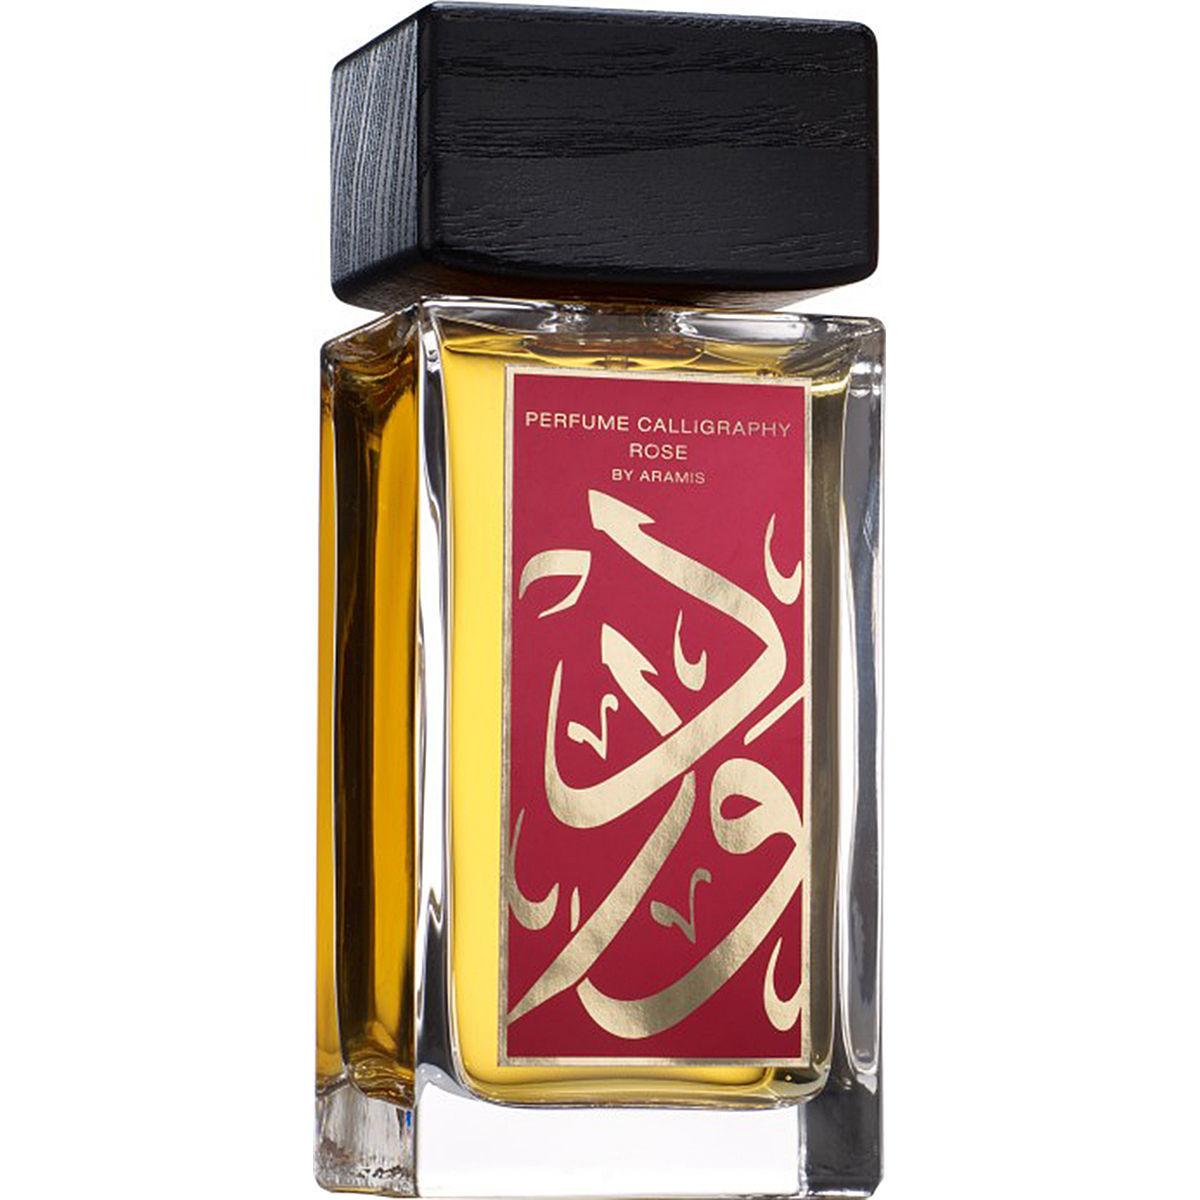 Perfume Calligraphy Rose Saffron By Aramis 2013